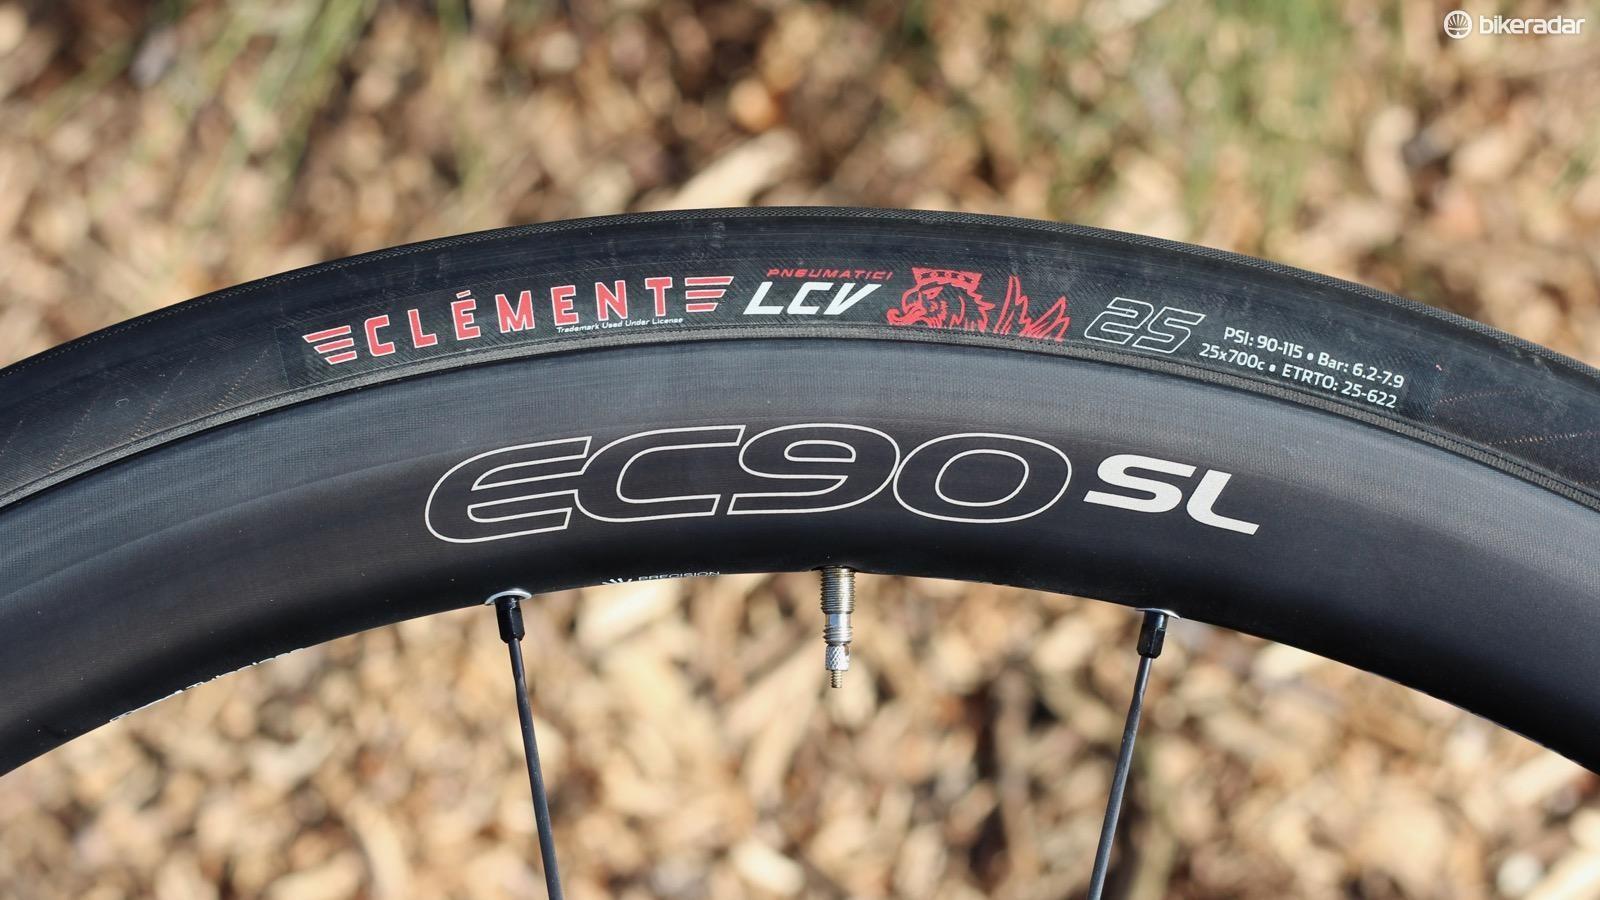 road-tire-test-6-1486070698663-bmnl4id9c4wh-4a5c42d